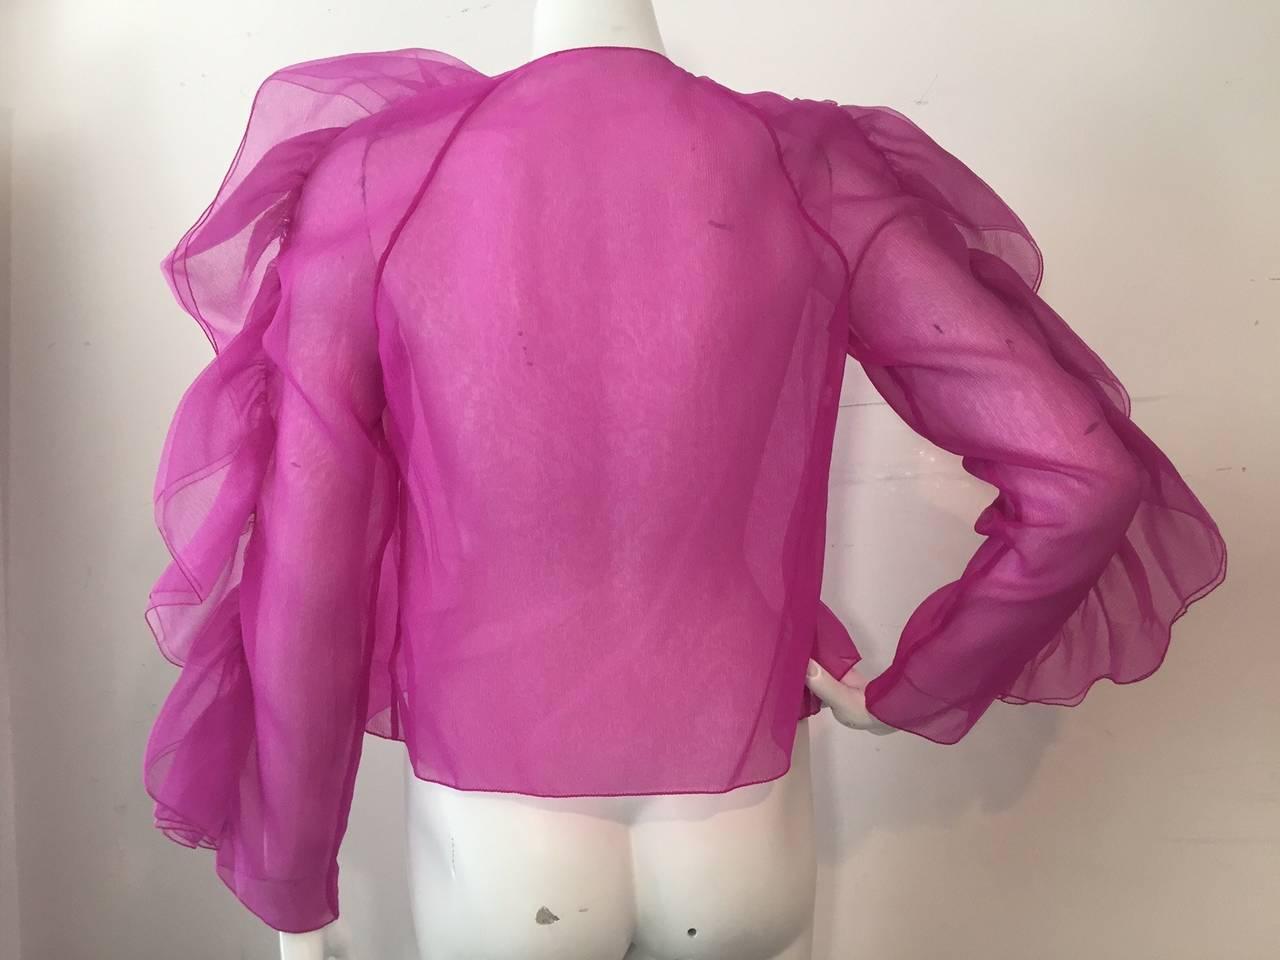 1980s Fuchsia Organza Ruffled-Sleeve Blouse 4